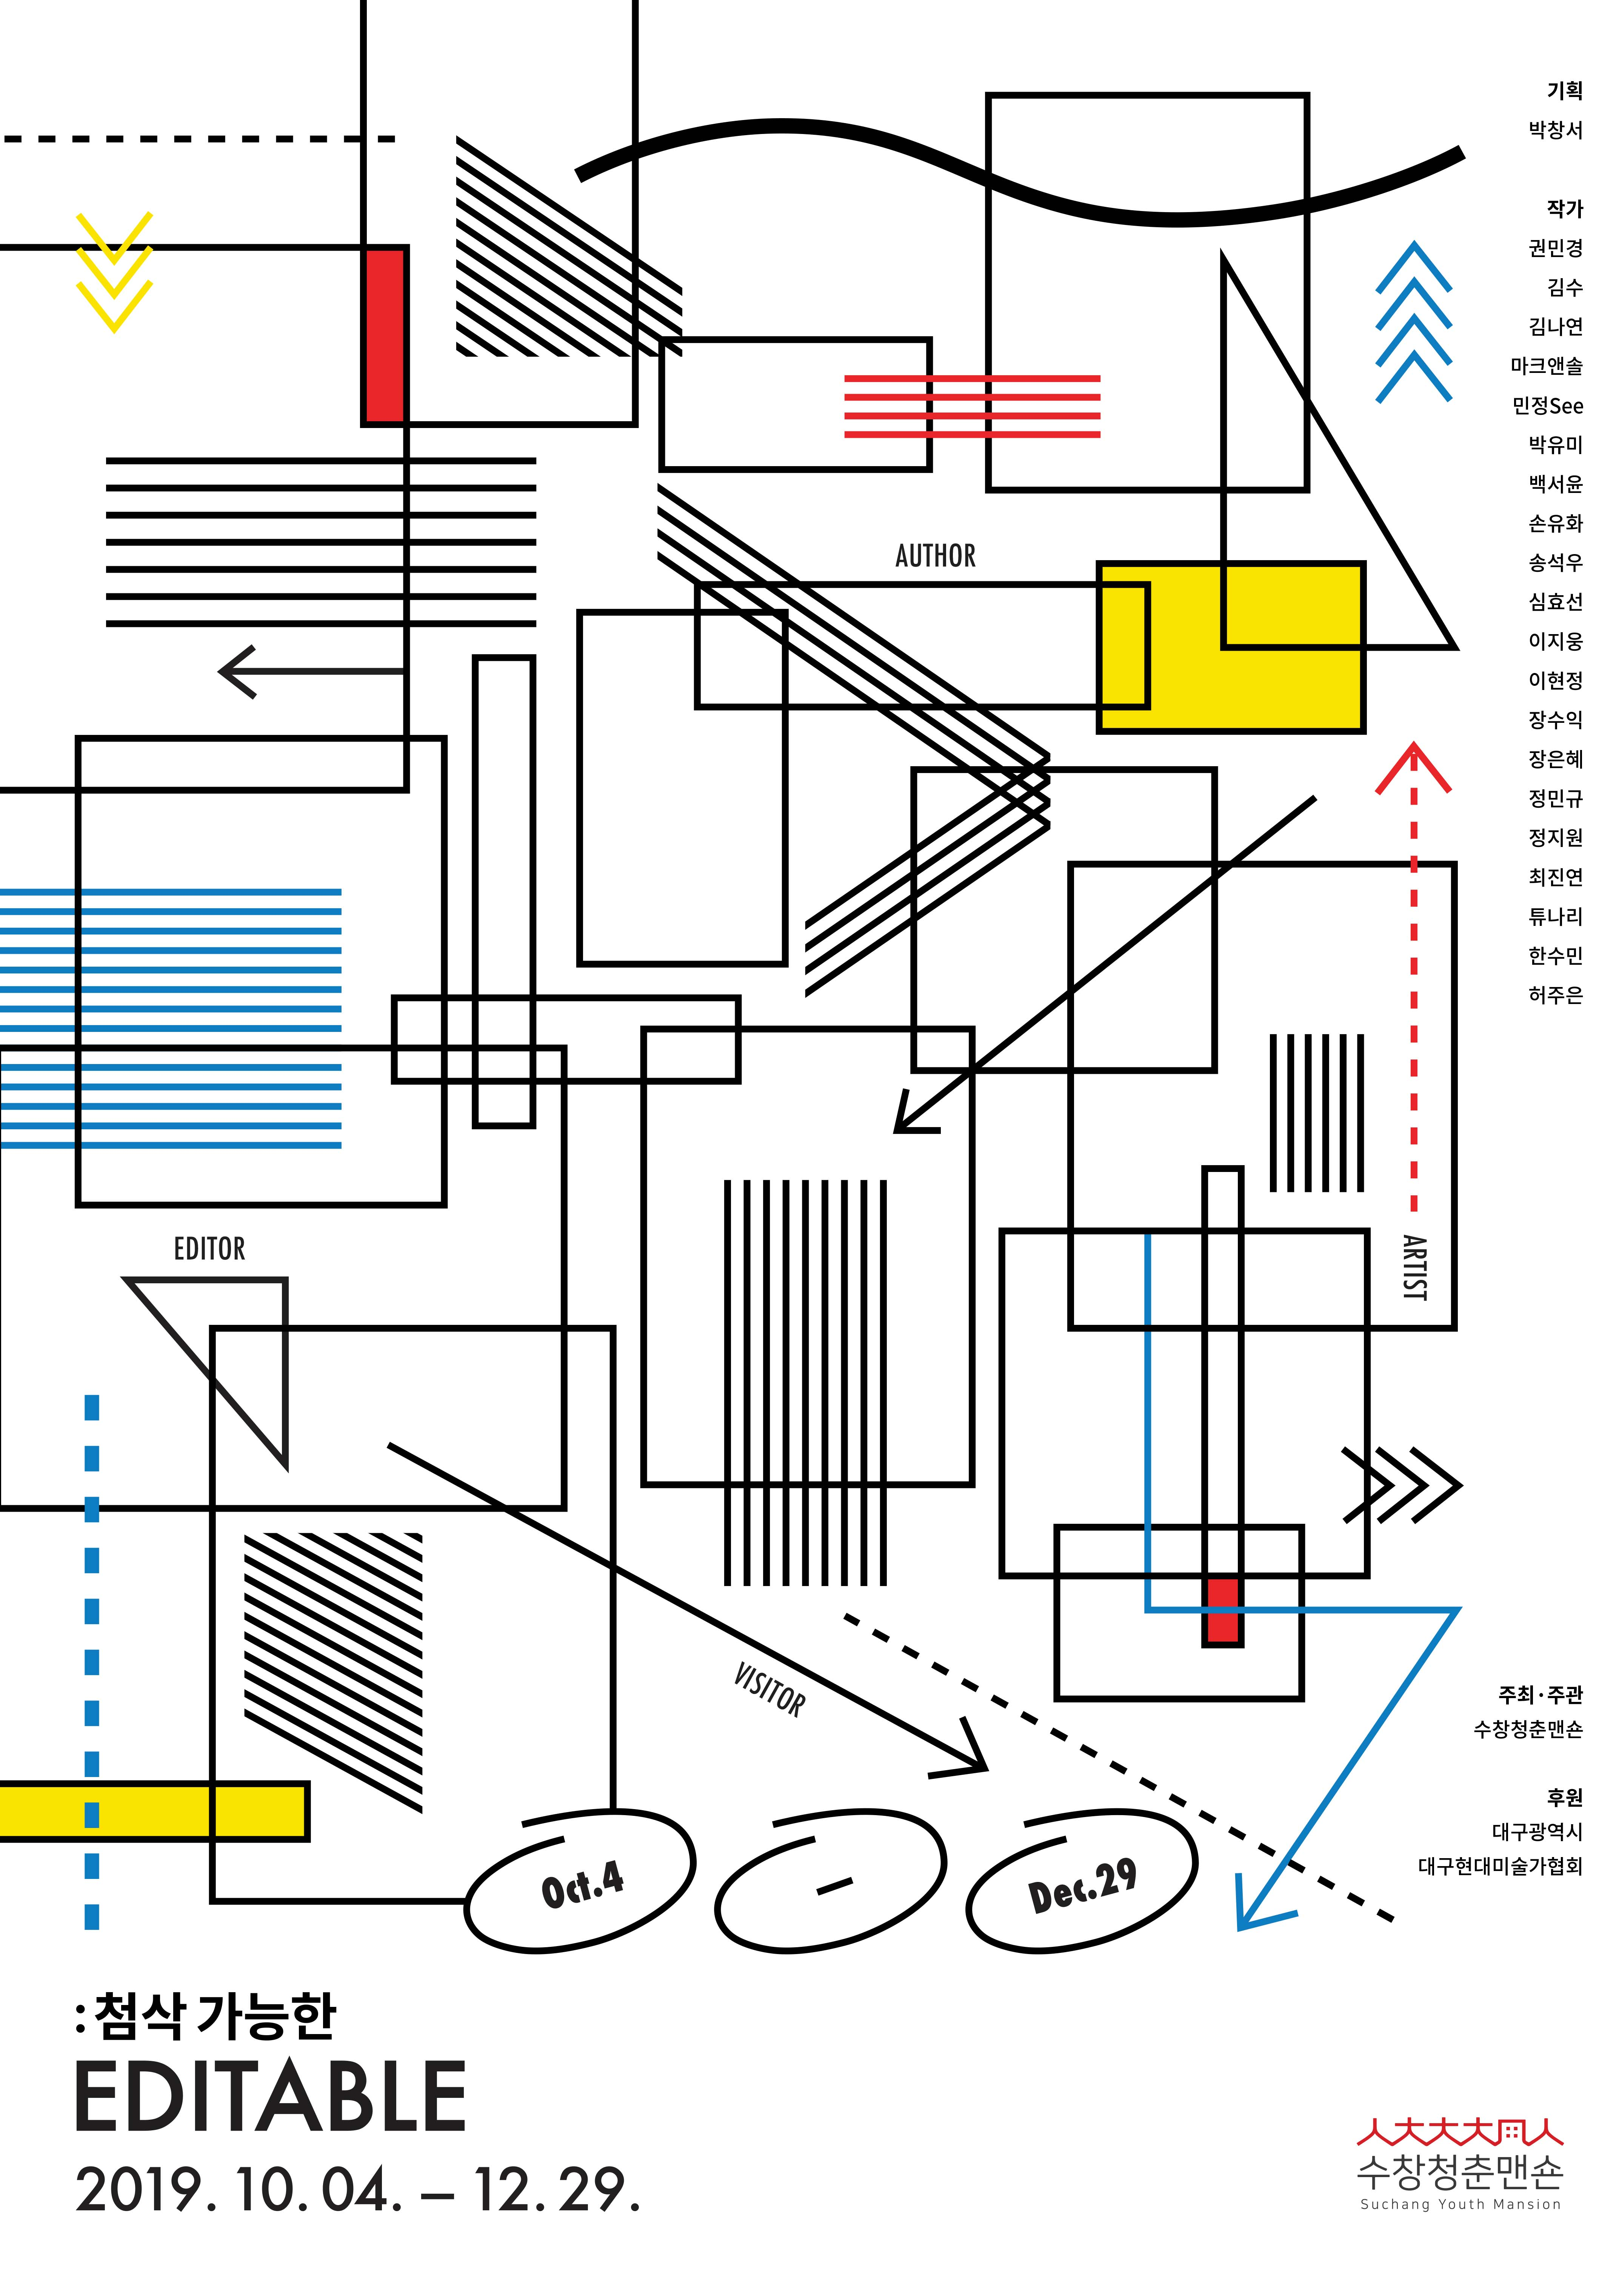 [Group Exhibition] 2019 EDITABLE : 첨삭 가능한, 수창청춘맨숀, 대구